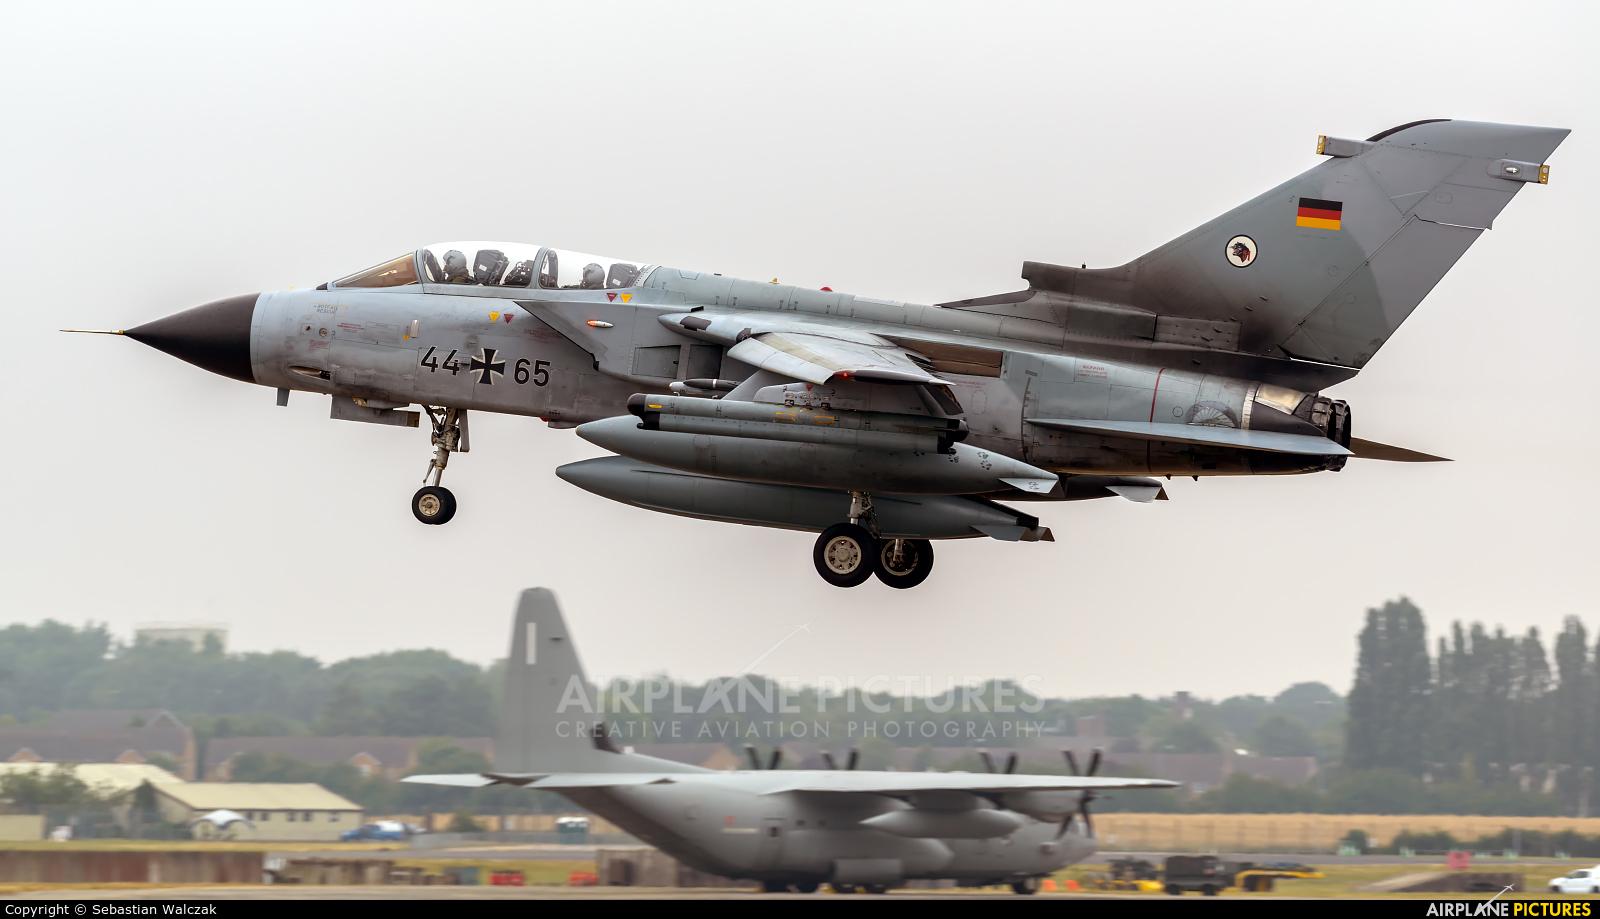 Germany - Air Force 44+65 aircraft at Fairford